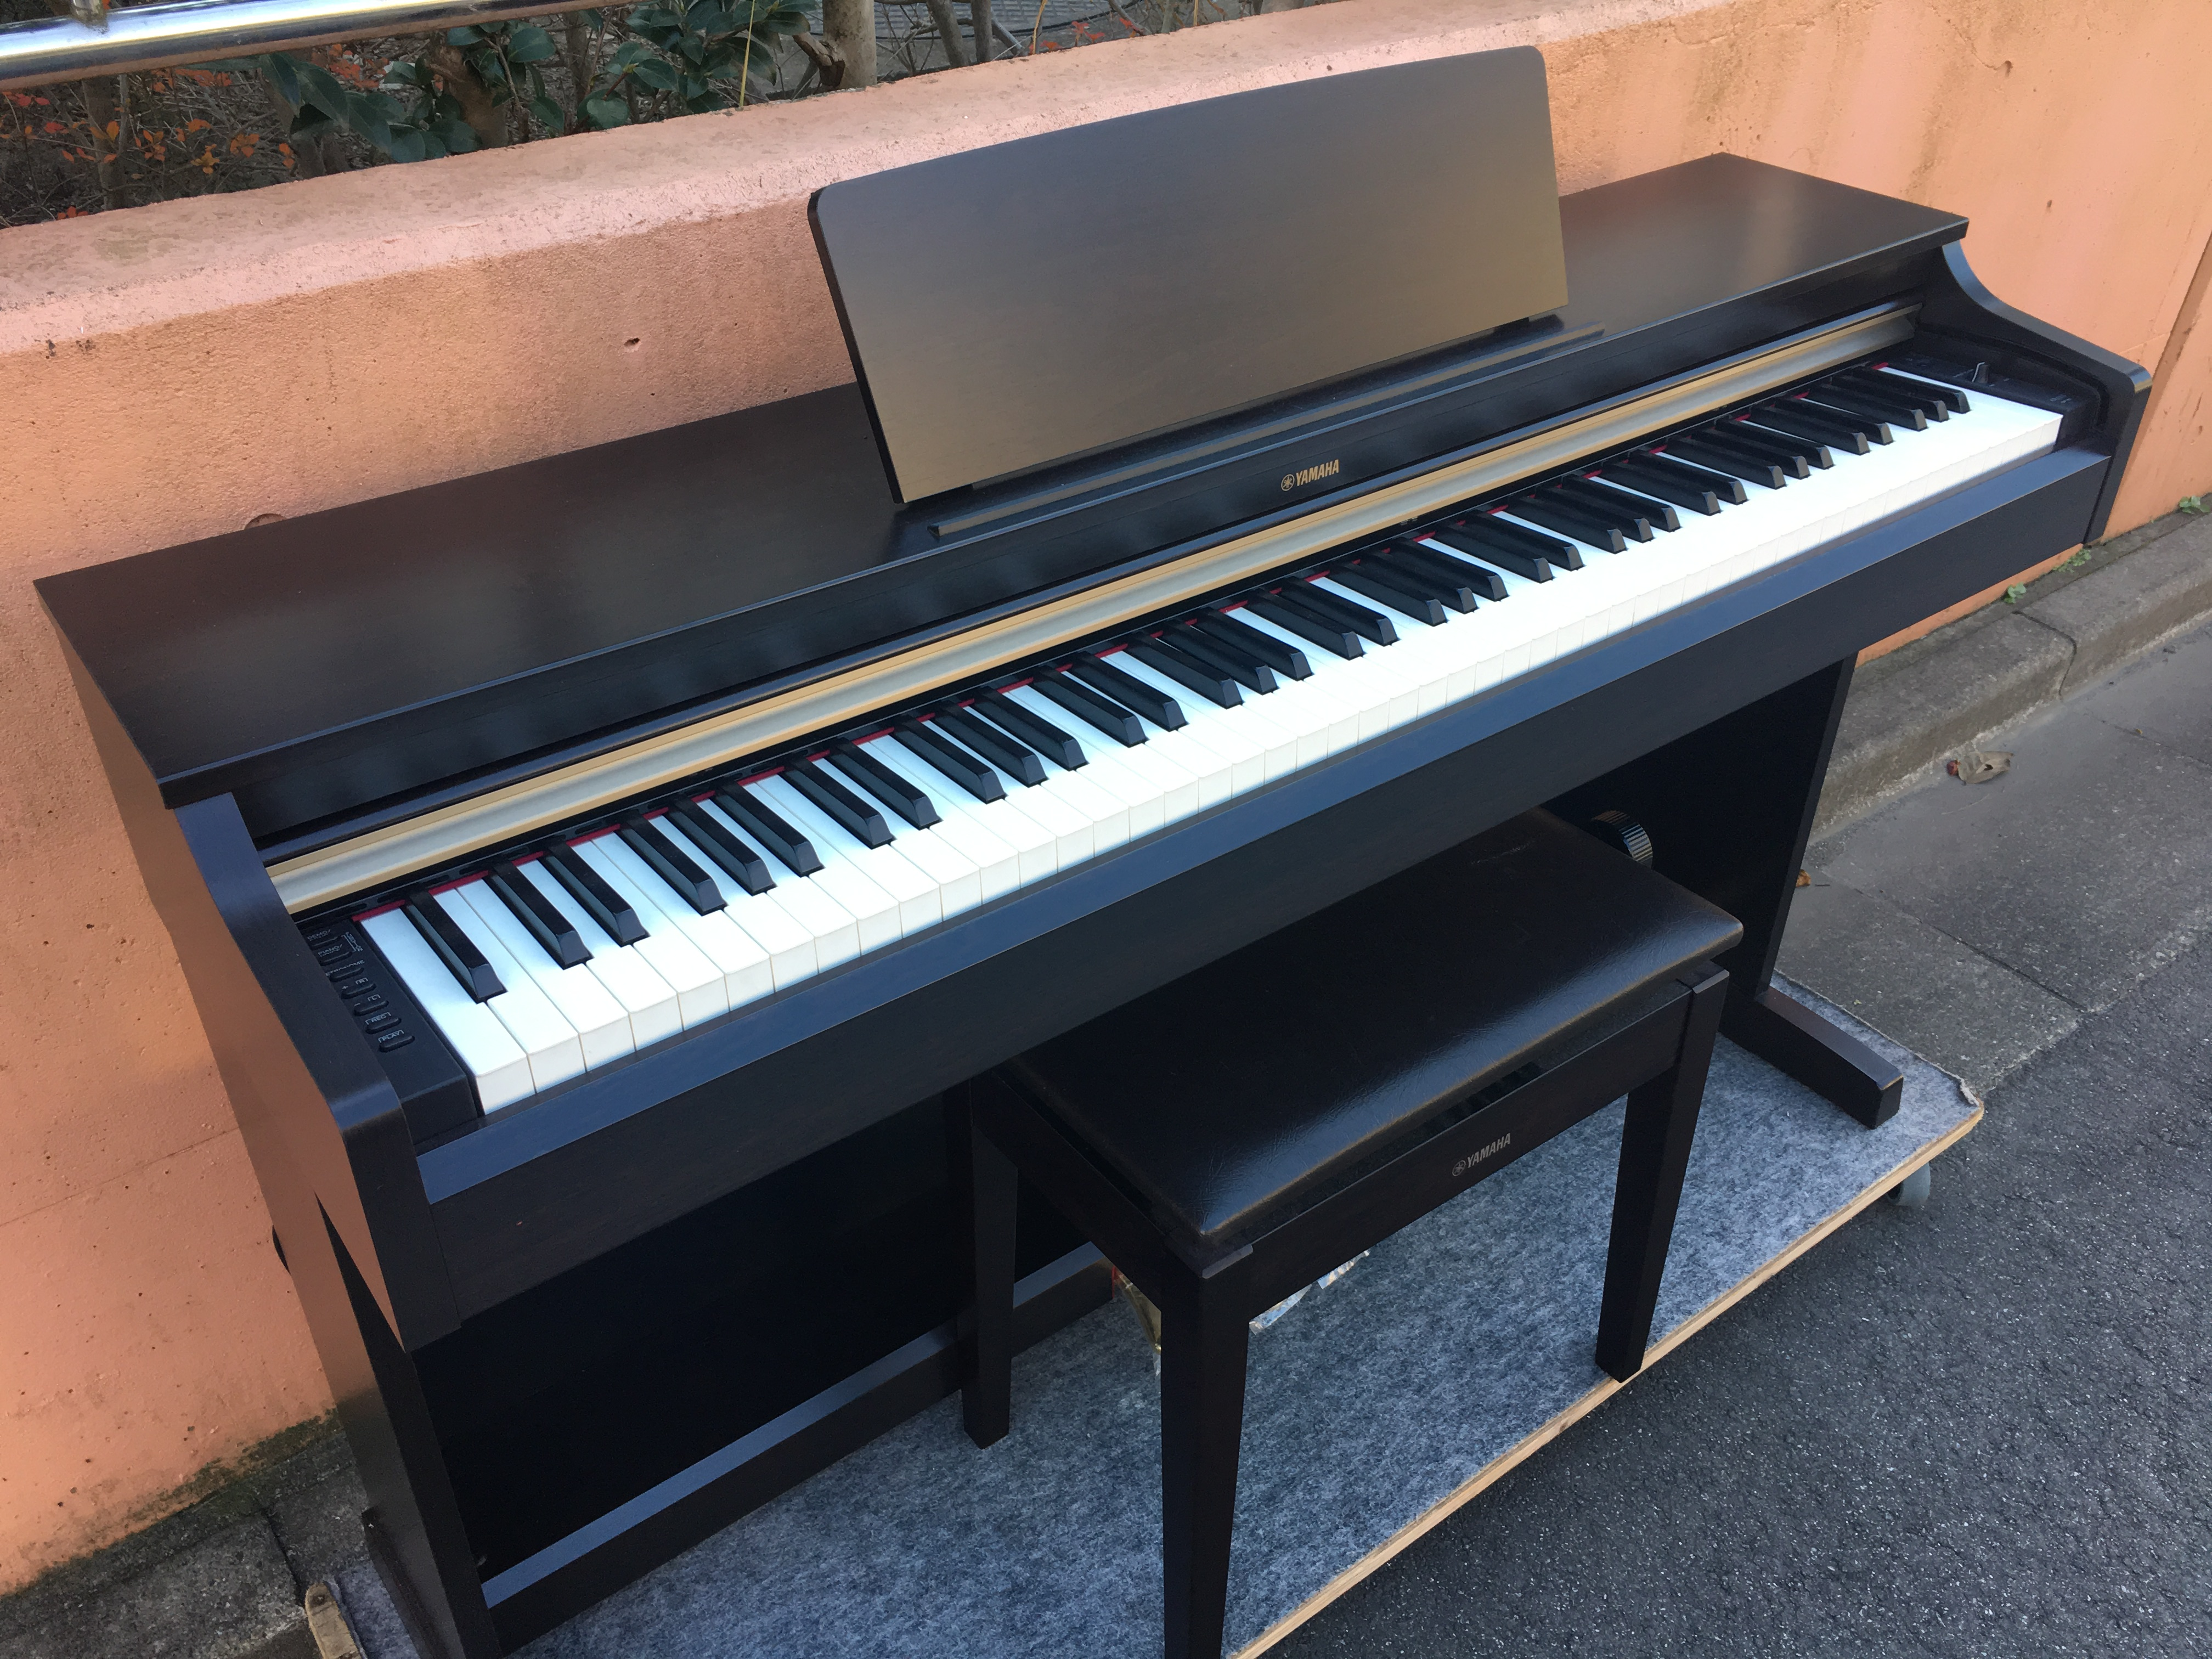 Ydp 162r com for Yamaha ydp 113 for sale